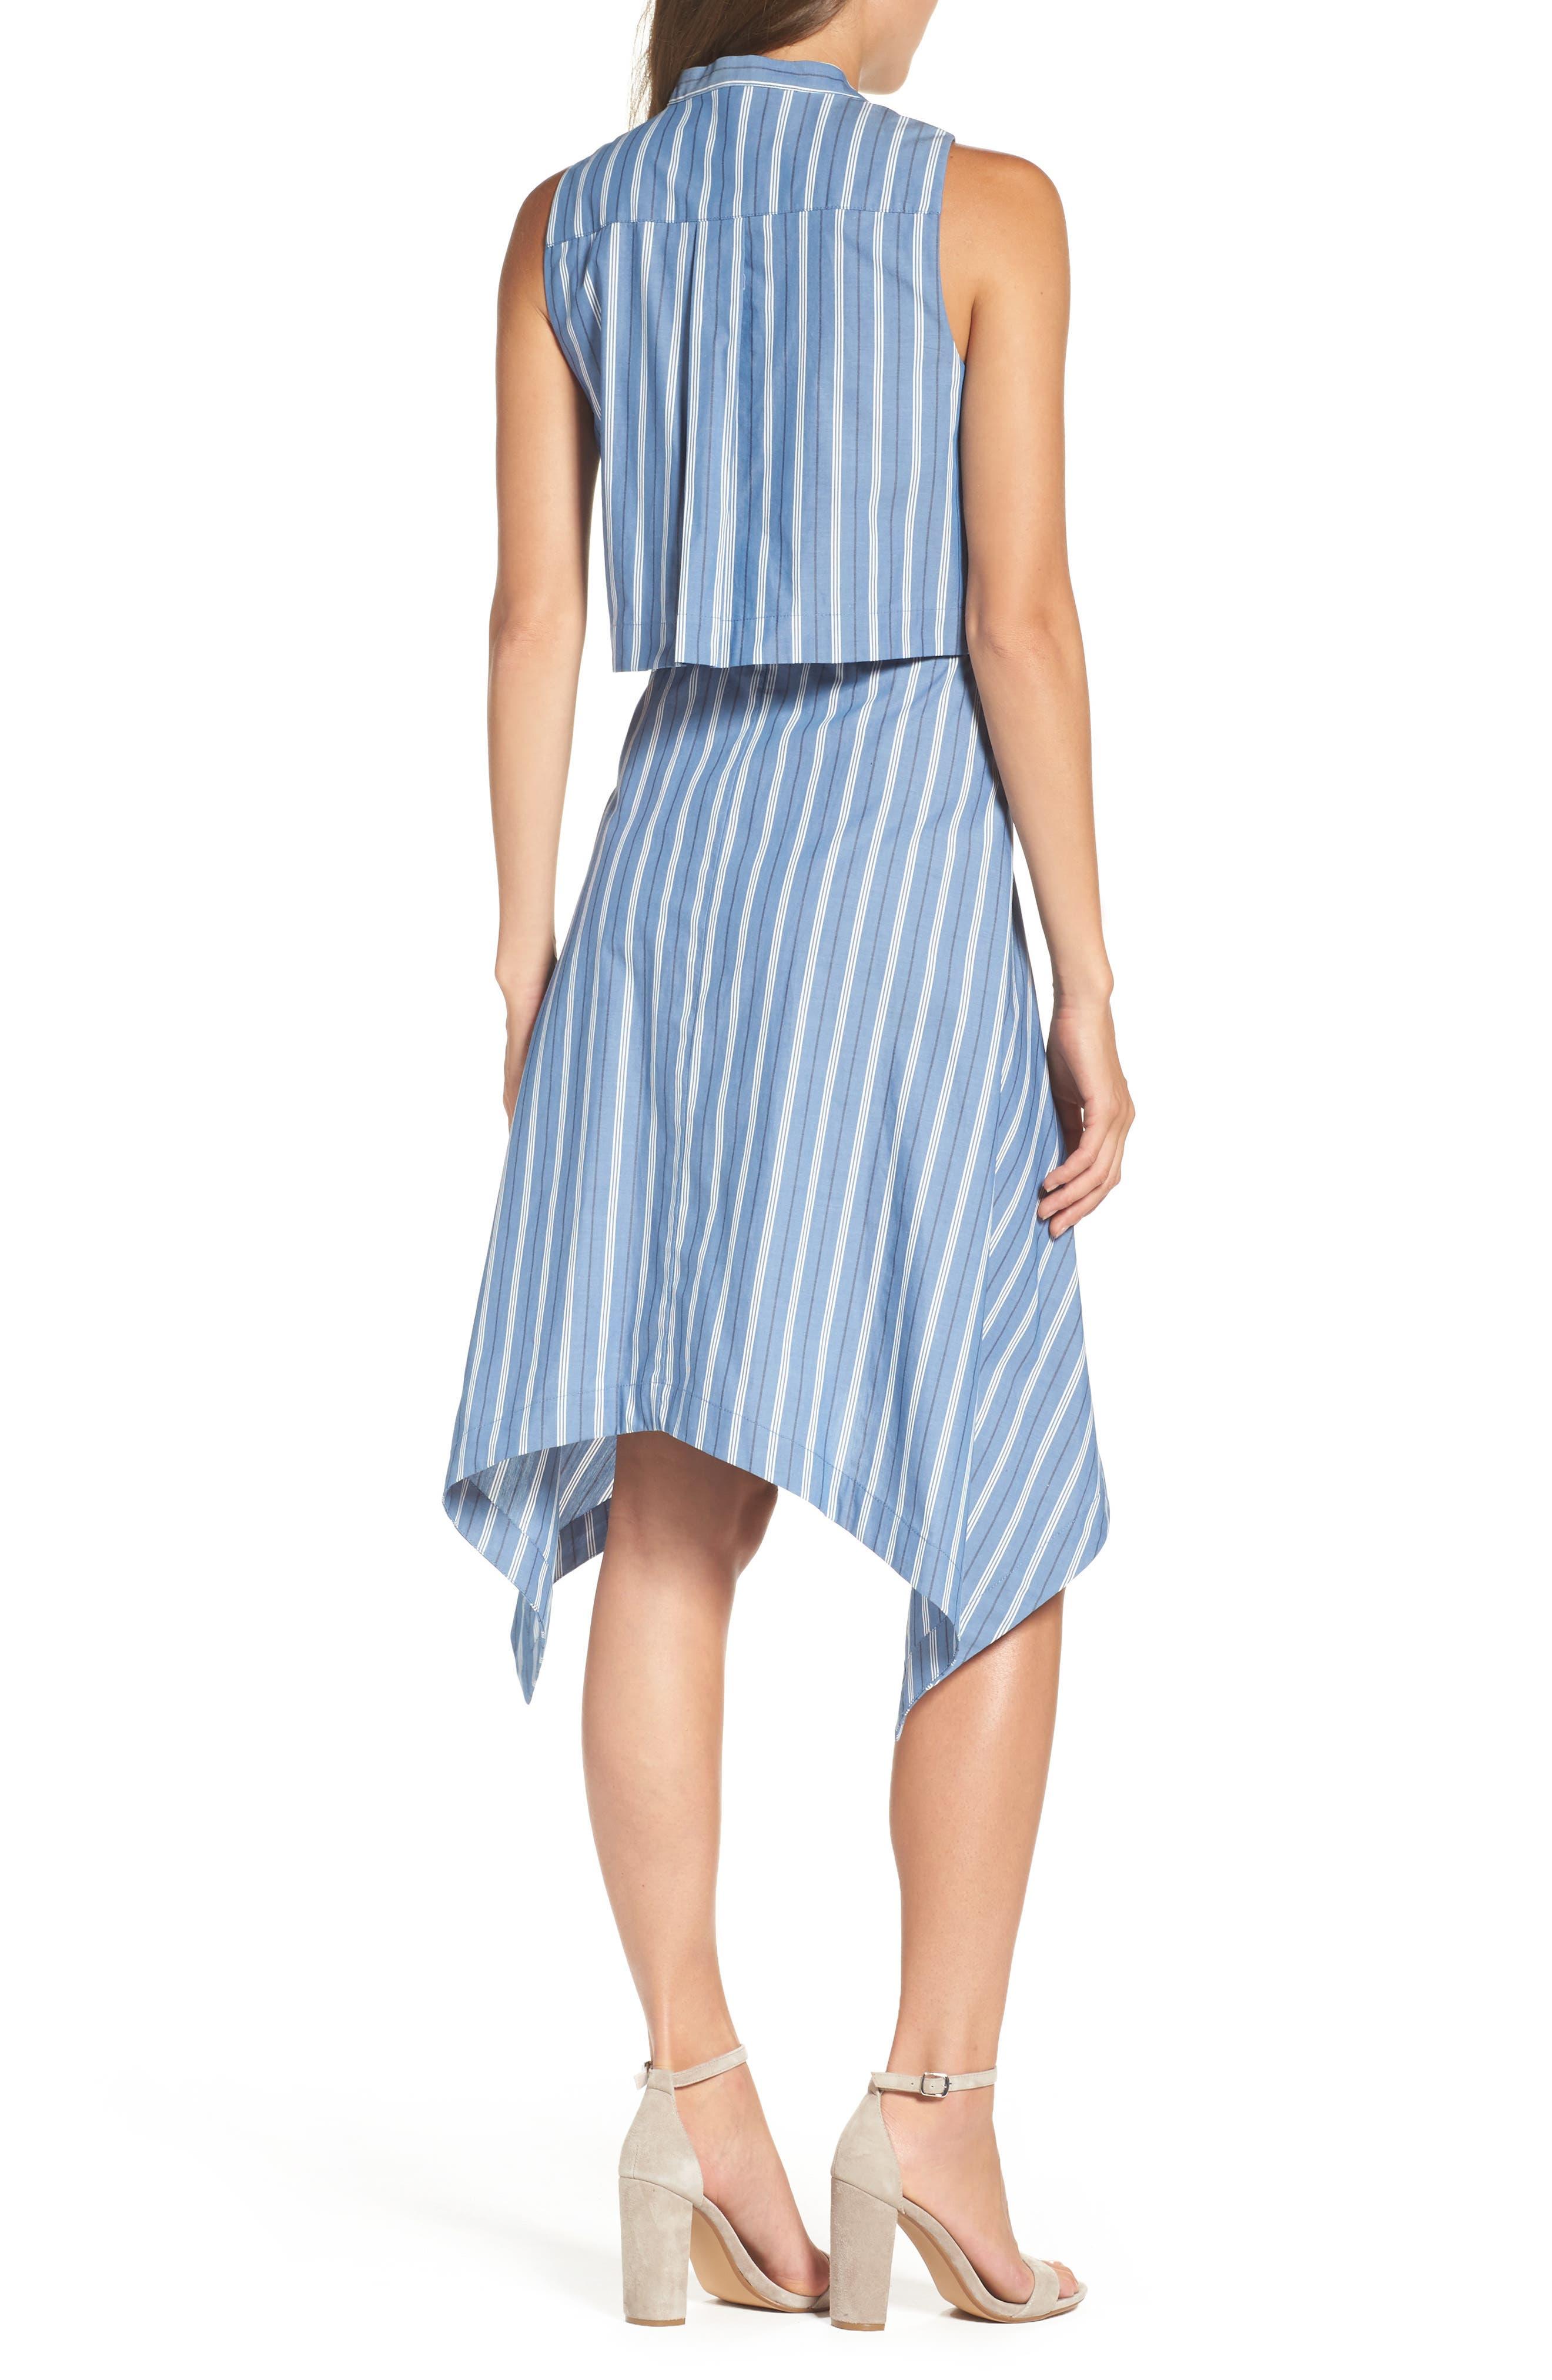 City Sleeveless Dress,                             Alternate thumbnail 2, color,                             404